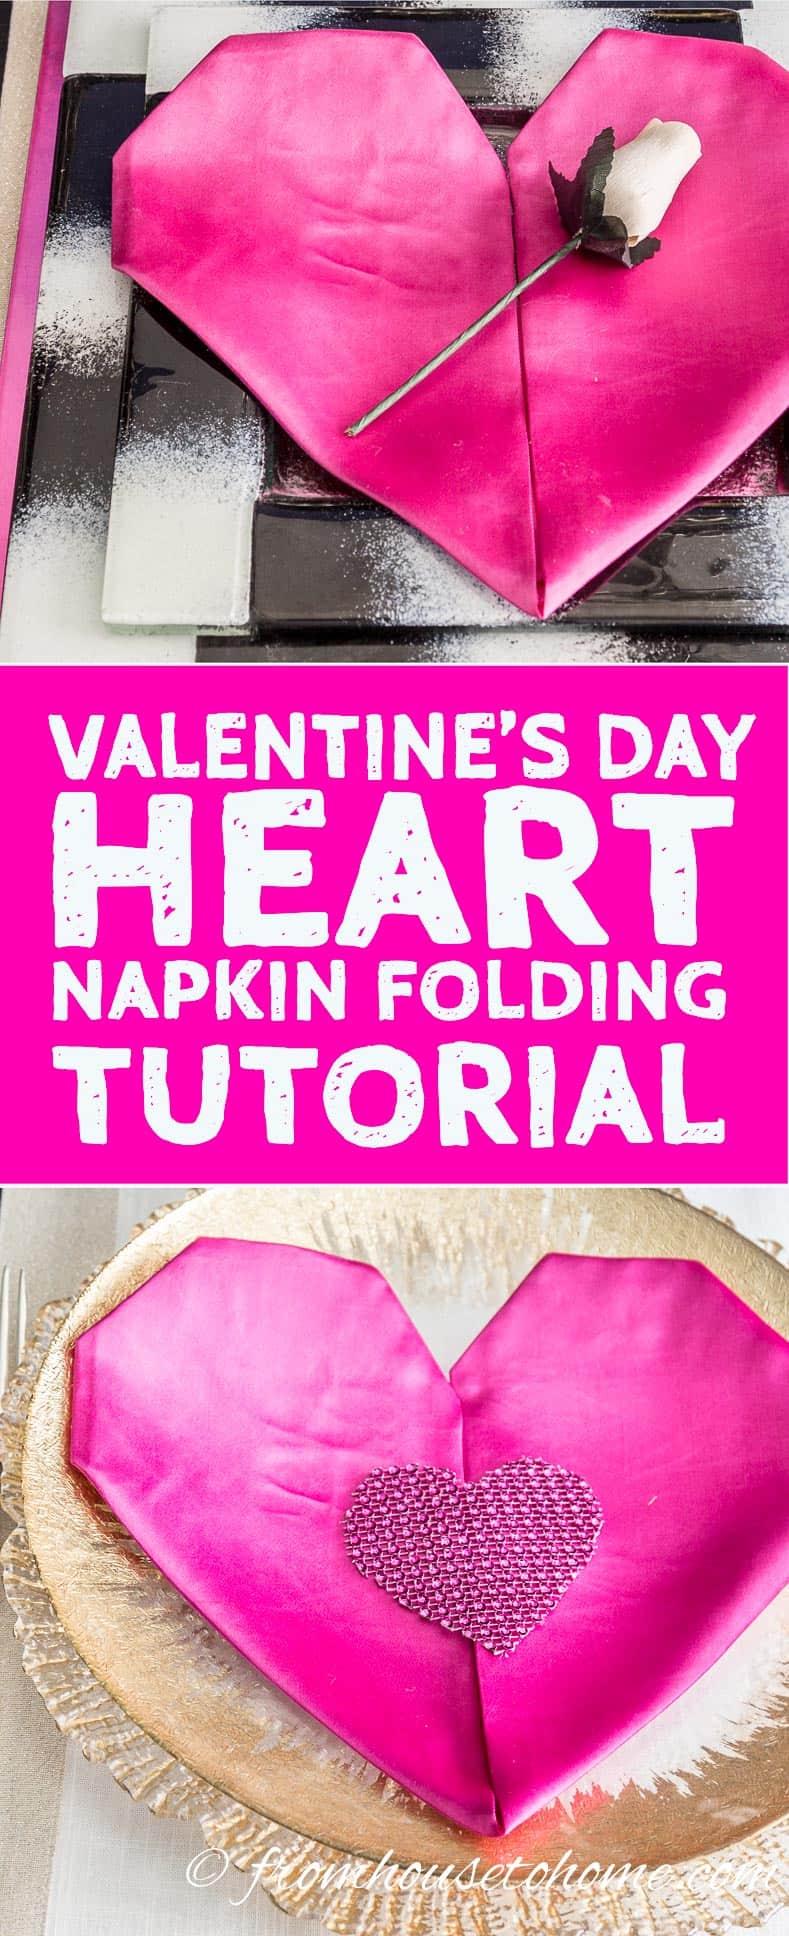 Valentine's Day How to: Easy Heart Napkin Folding Tutorial